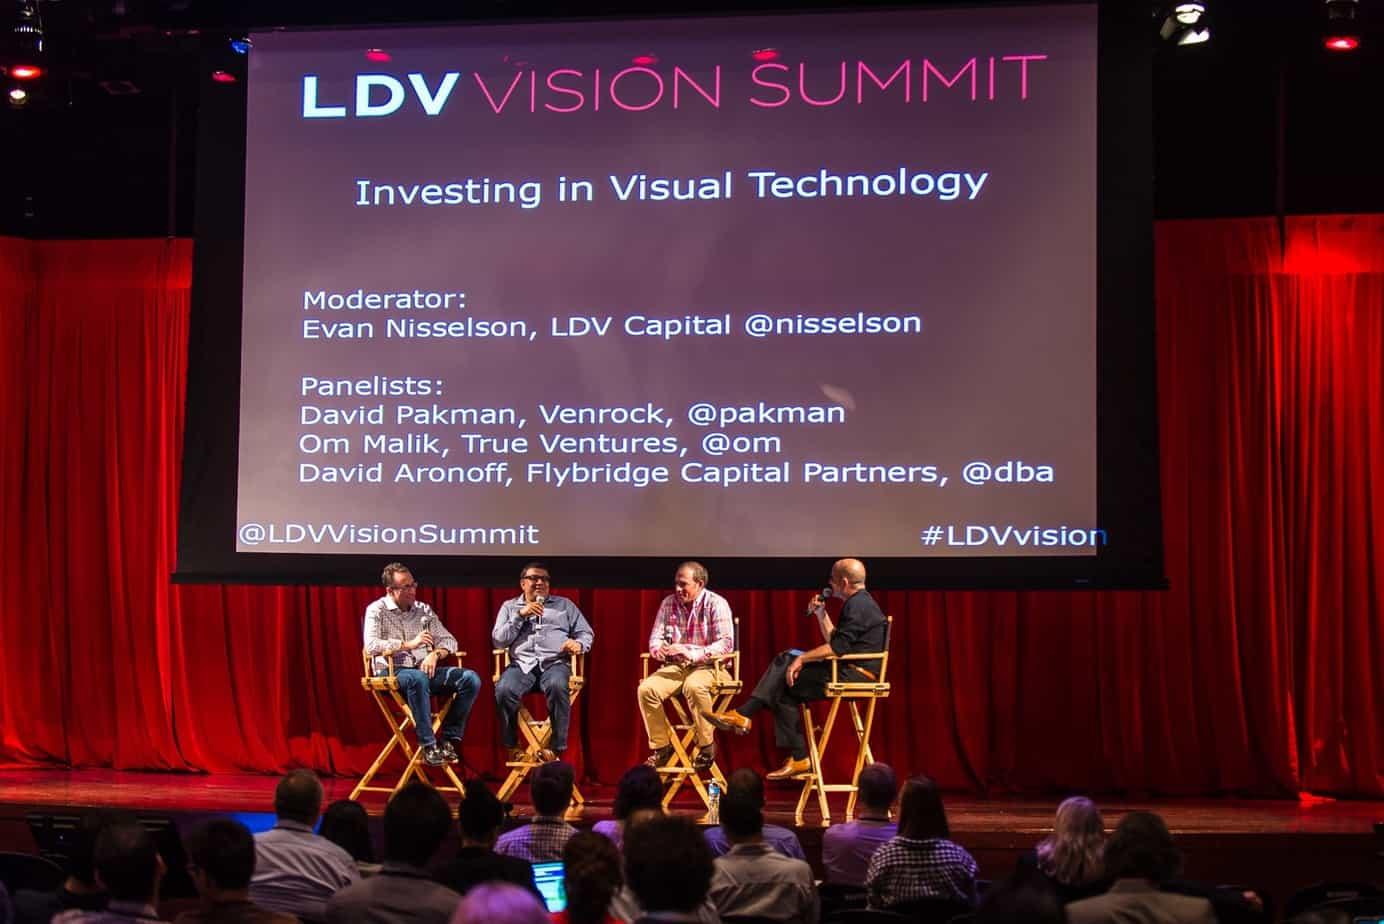 New York, New York June 4, 2014. LDV Vision Summit - Image ©Dan Taylor/Heisenberg Media - http://www.heisenbergmedia.com/